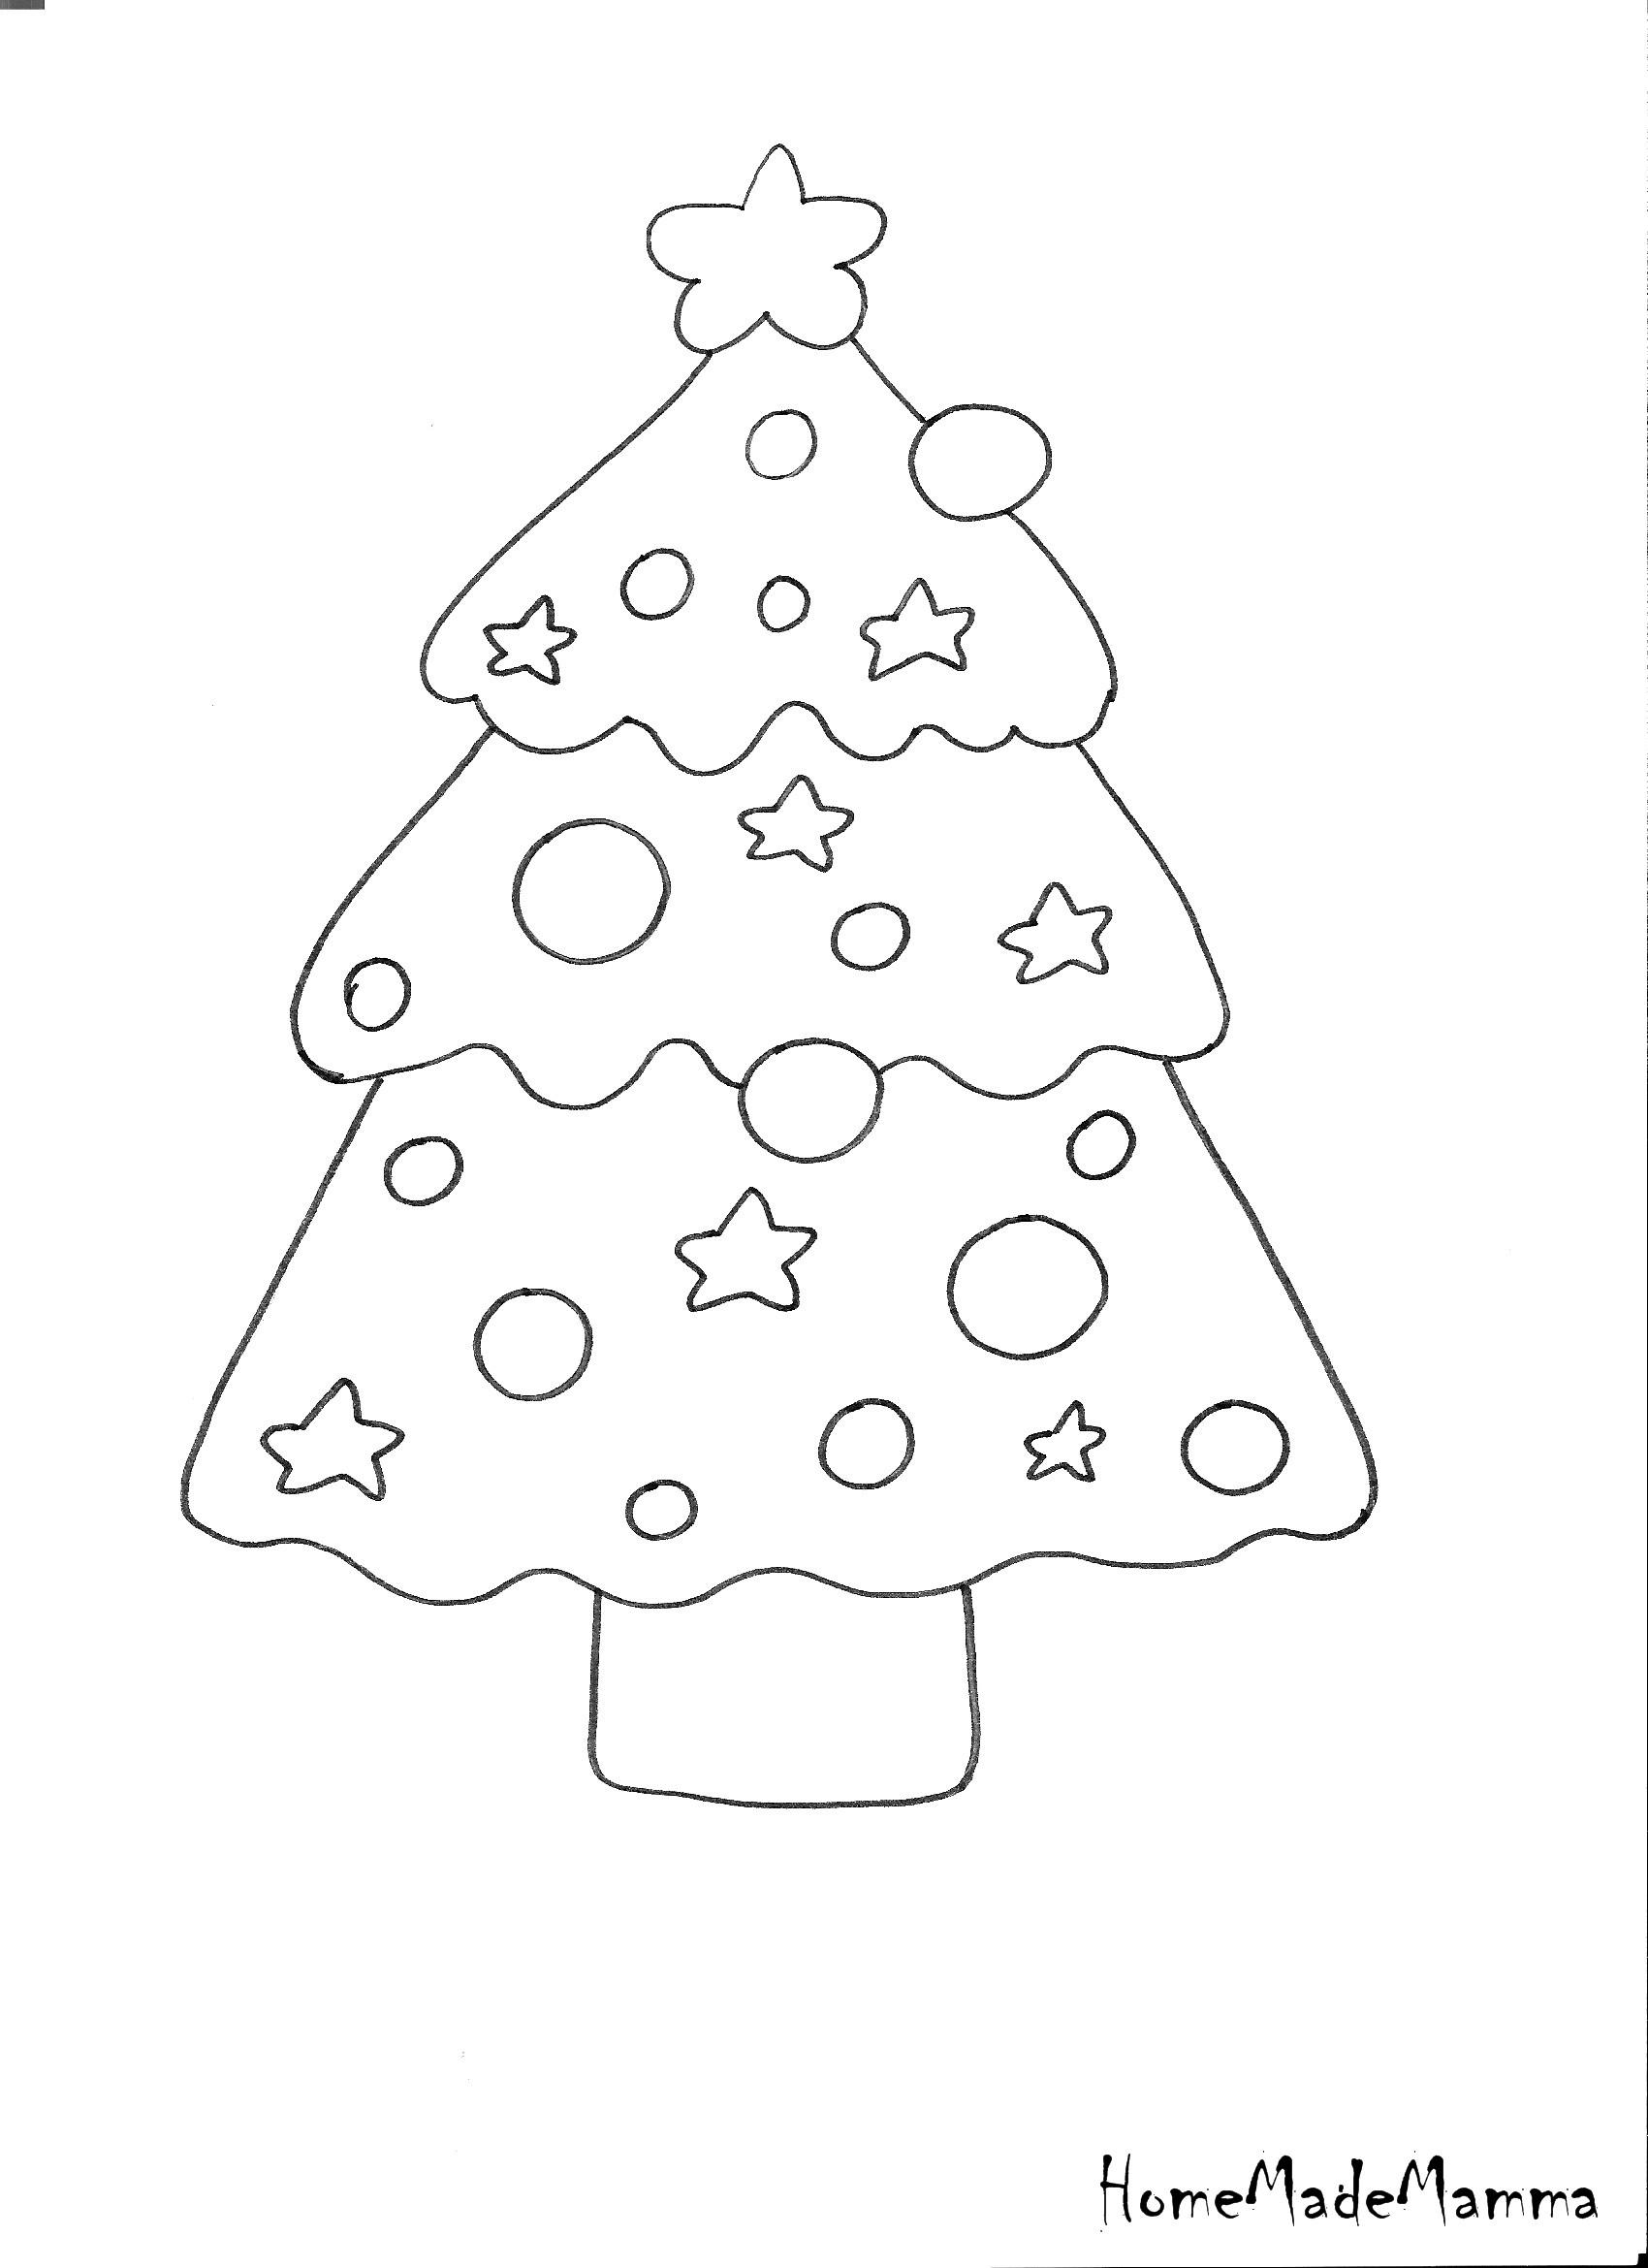 Alberelli candele renne vetrofanie natalizie fai da te for Disegni di natale facili per bambini